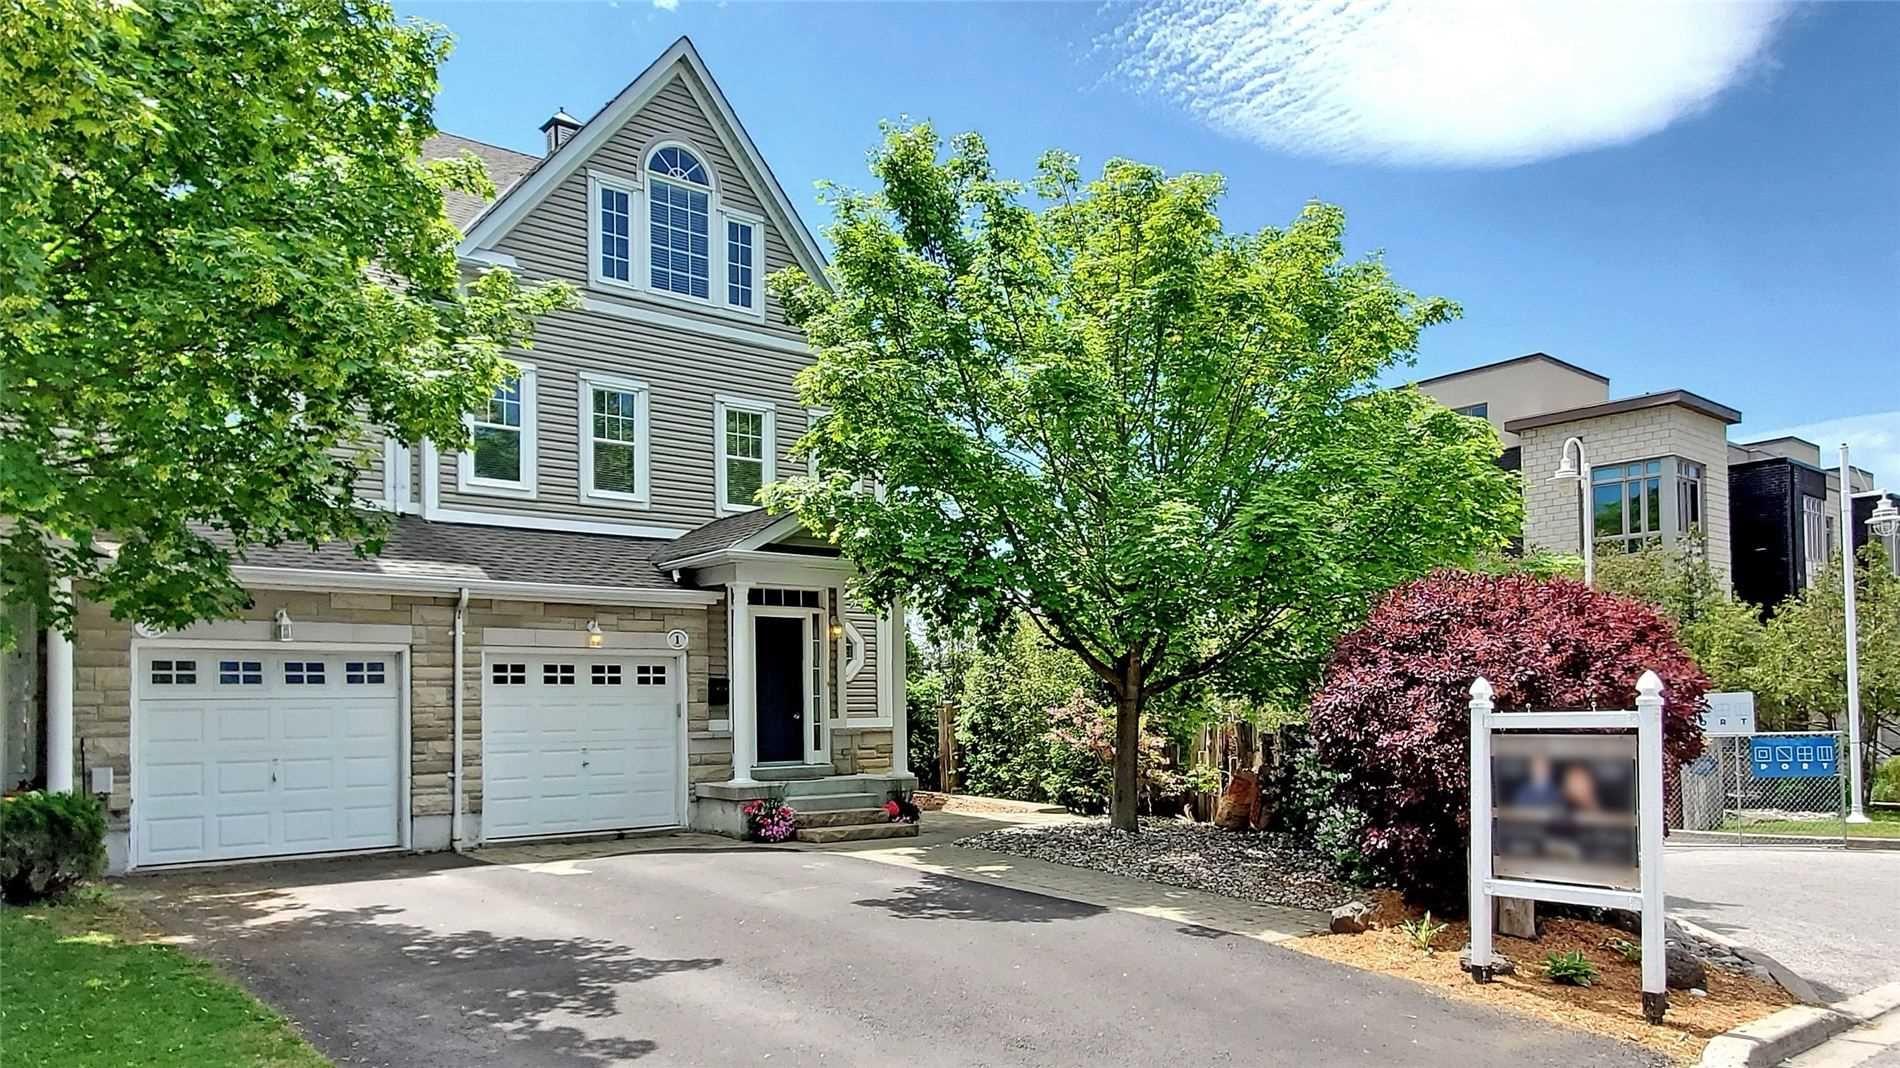 Main Photo: 1 1295 Wharf Street in Pickering: Bay Ridges House (3-Storey) for sale : MLS®# E4788152